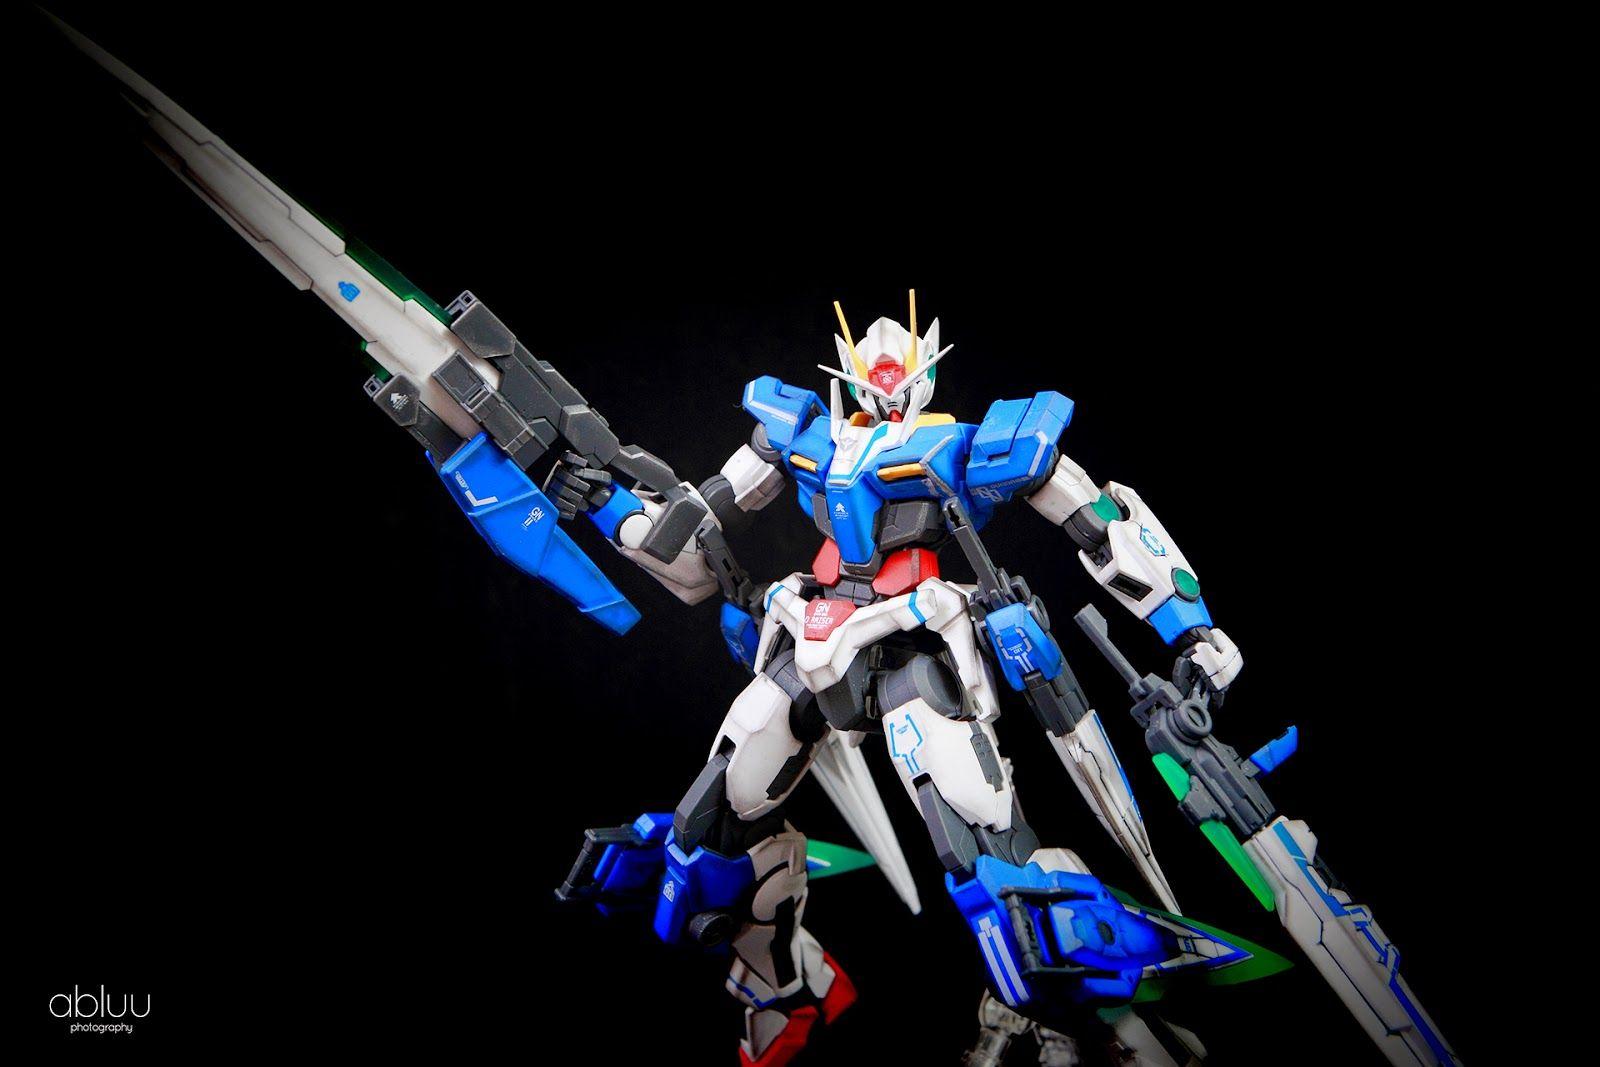 MG 1/100 00 Raiser HWS Custom Build - Gundam Kits Collection News and Reviews